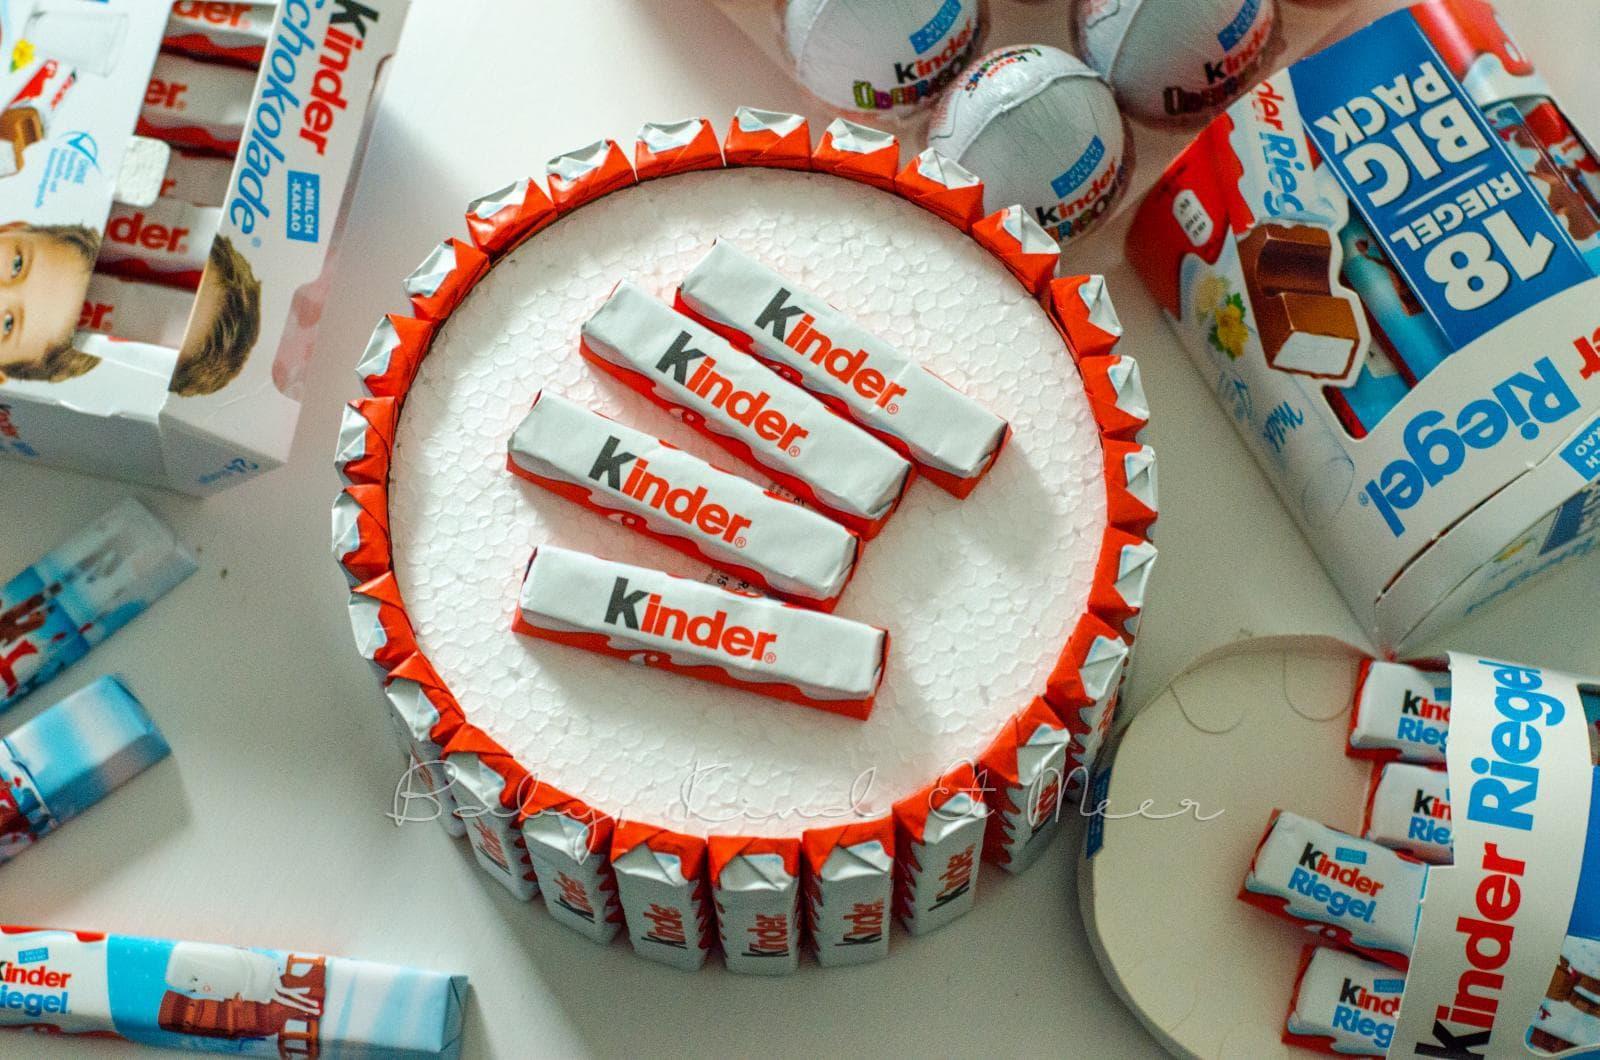 DIY TORTE AUS KINDERSCHOKOLADE  Do It Yourself